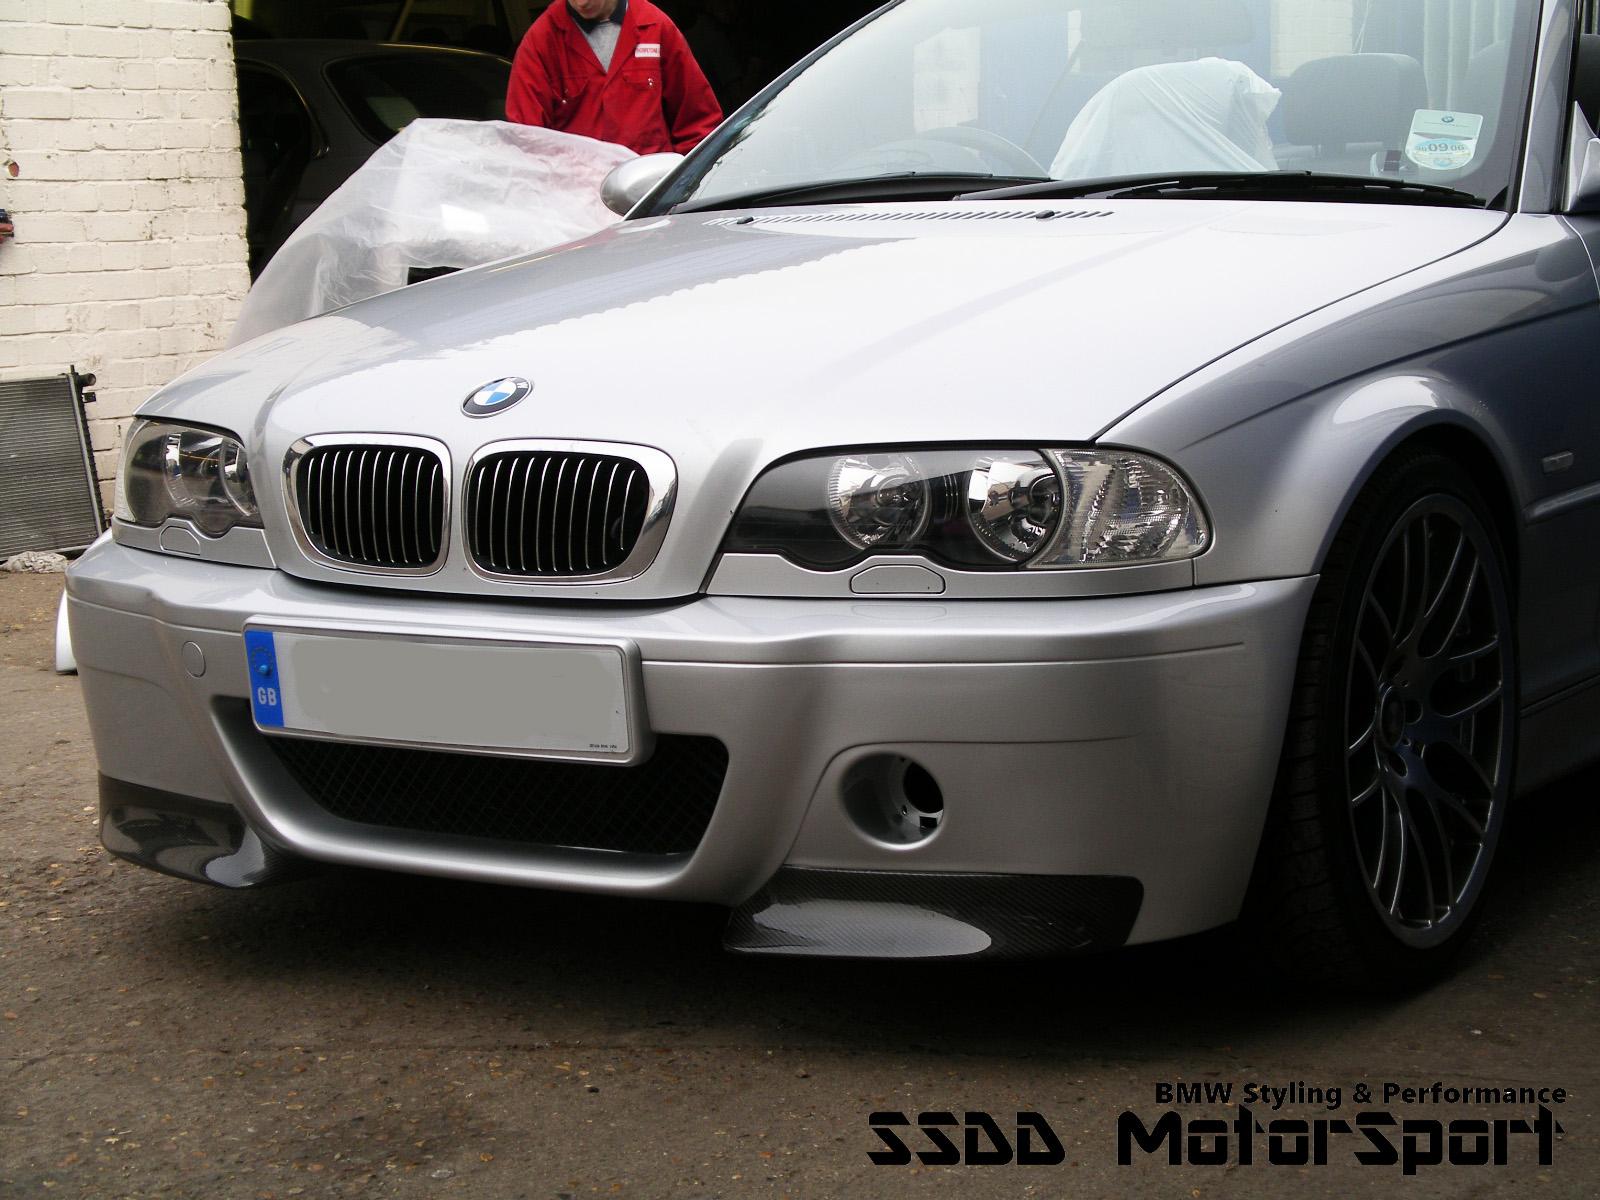 bmw-e46-m3-csl-bumper-coupe-convertible-non-m3-2.jpg